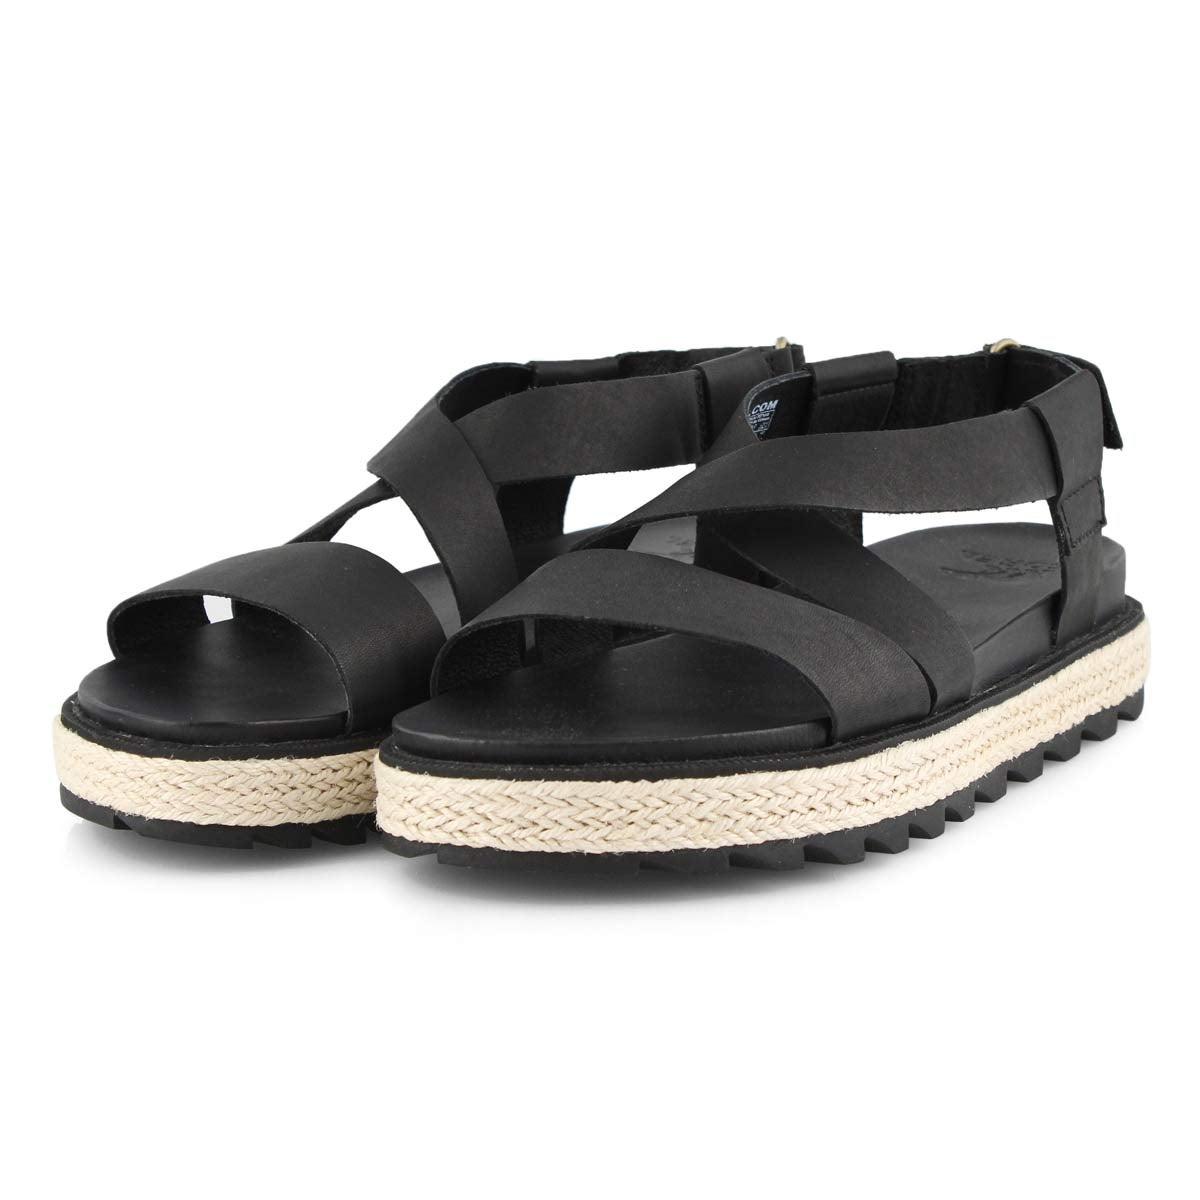 Sandale,RoamingCrissJute, noir, femmes